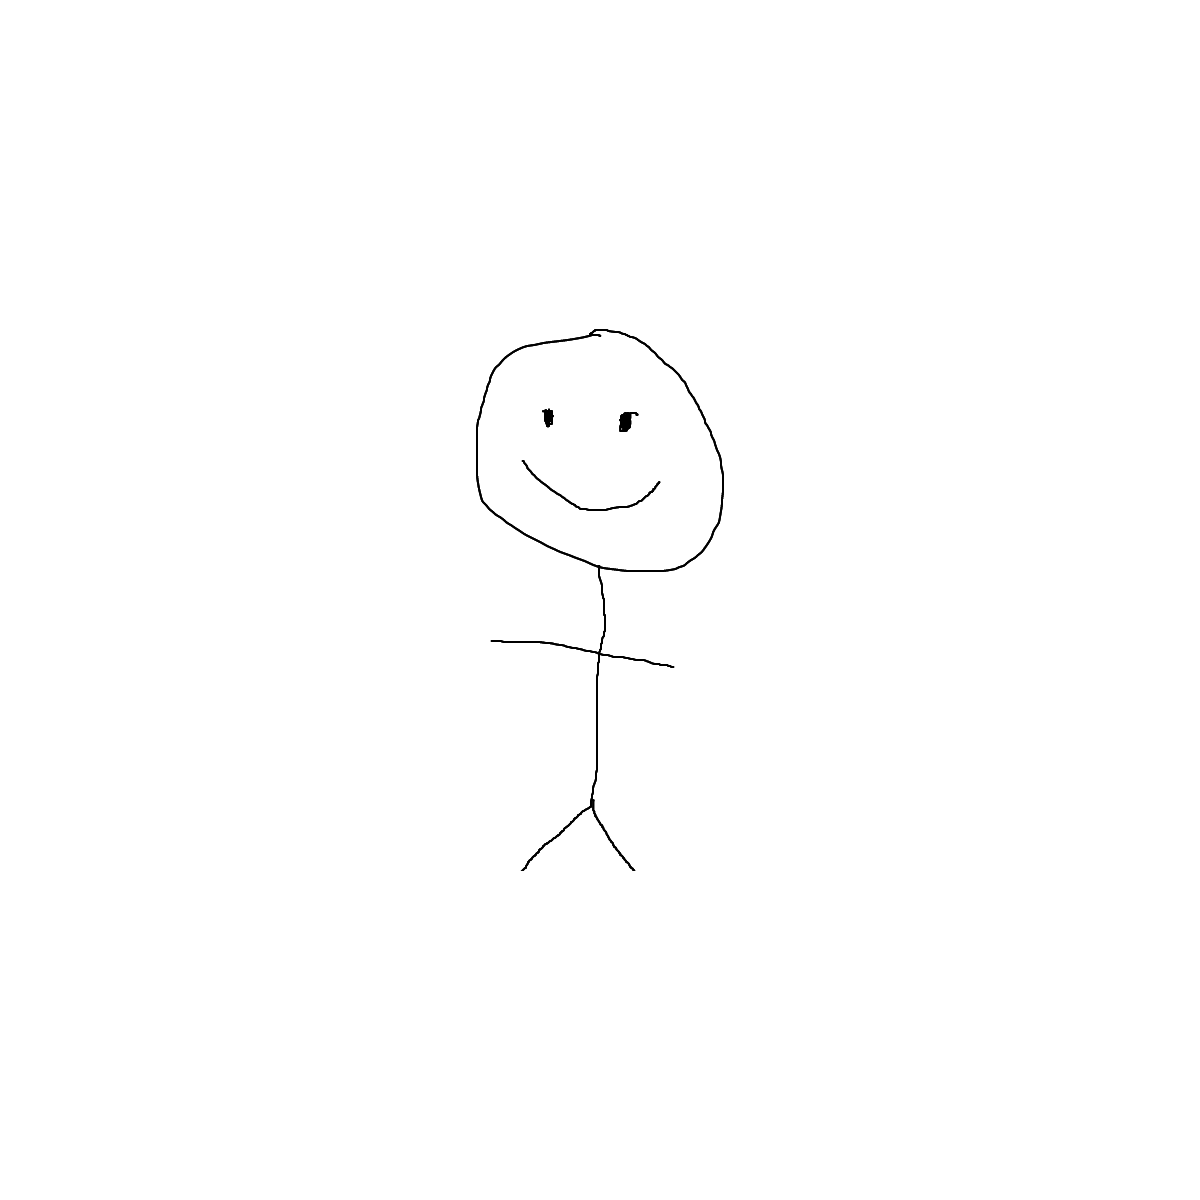 BAAAM drawing#7400 lat:47.5343627929687500lng: -52.7653846740722660